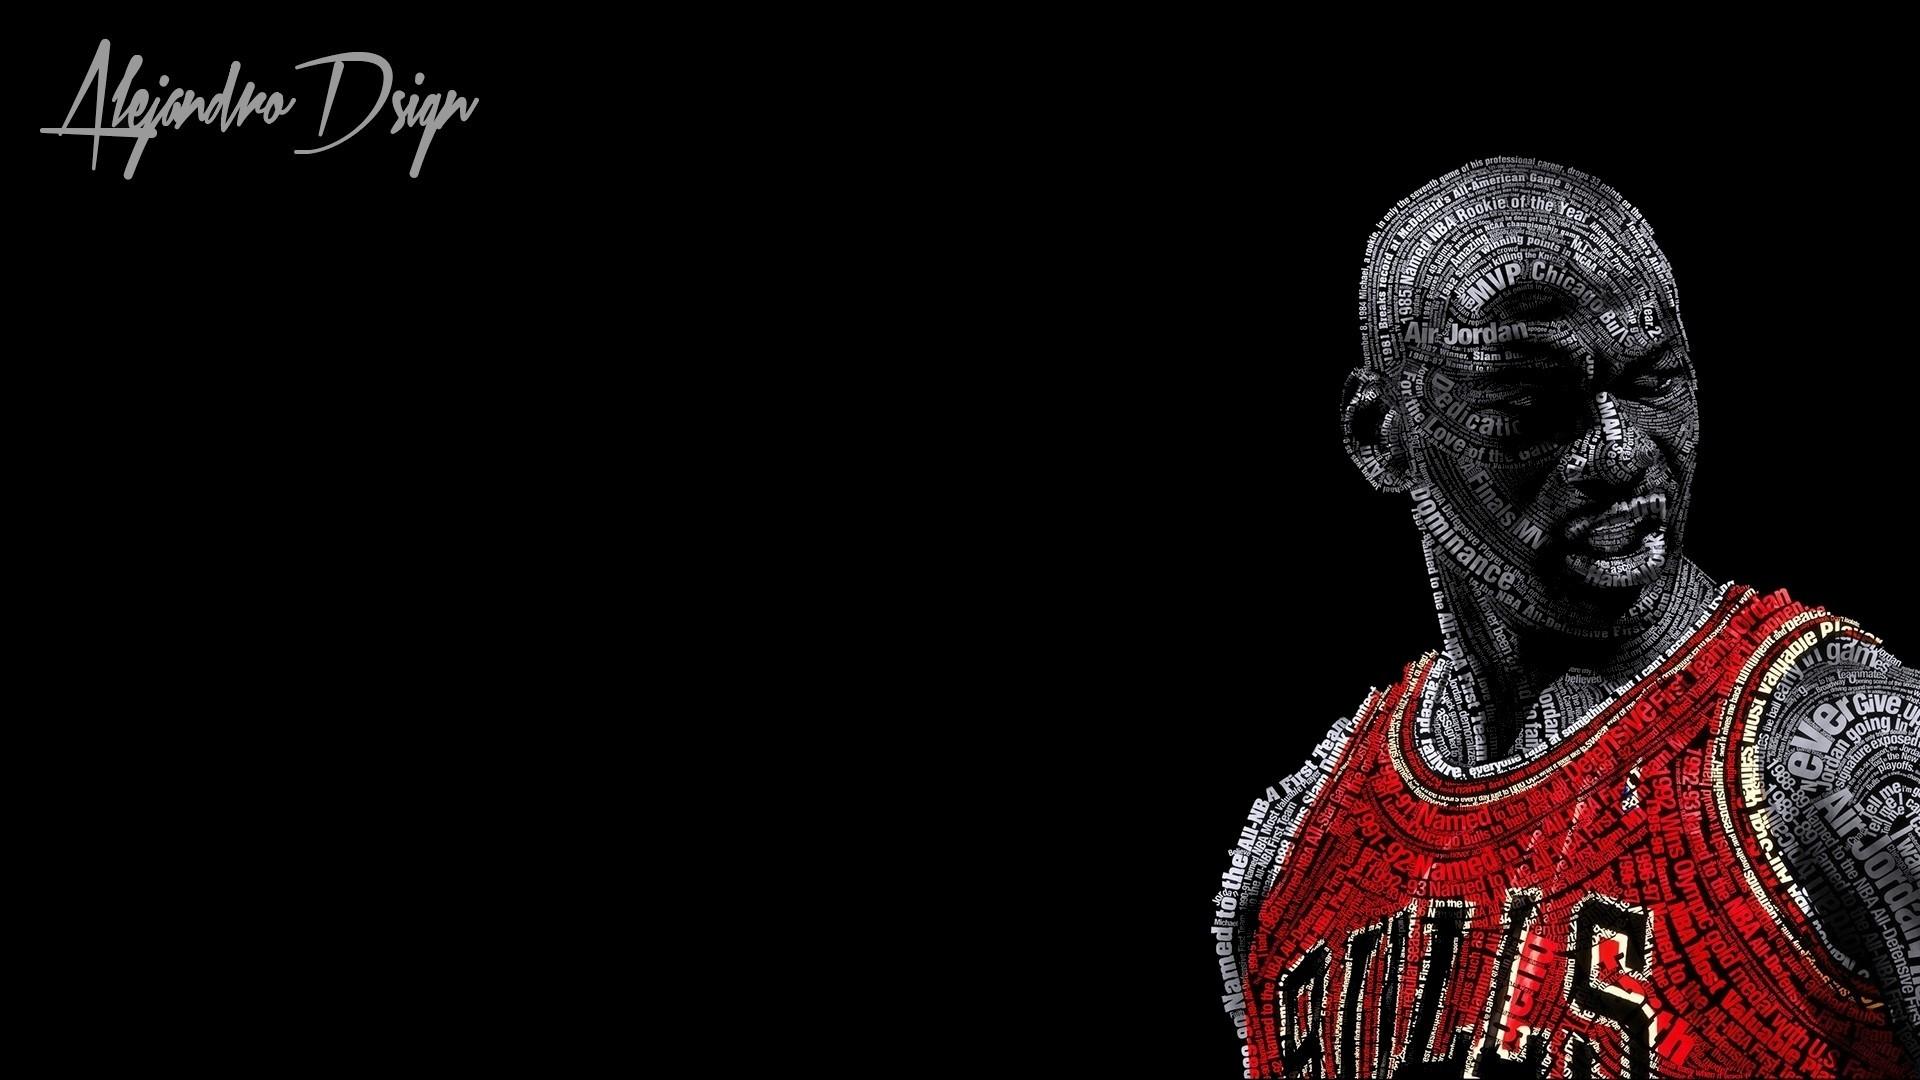 typographic Portraits, Michael Jordan, Basketball, Chicago Bulls, Black  Background Wallpapers HD / Desktop and Mobile Backgrounds